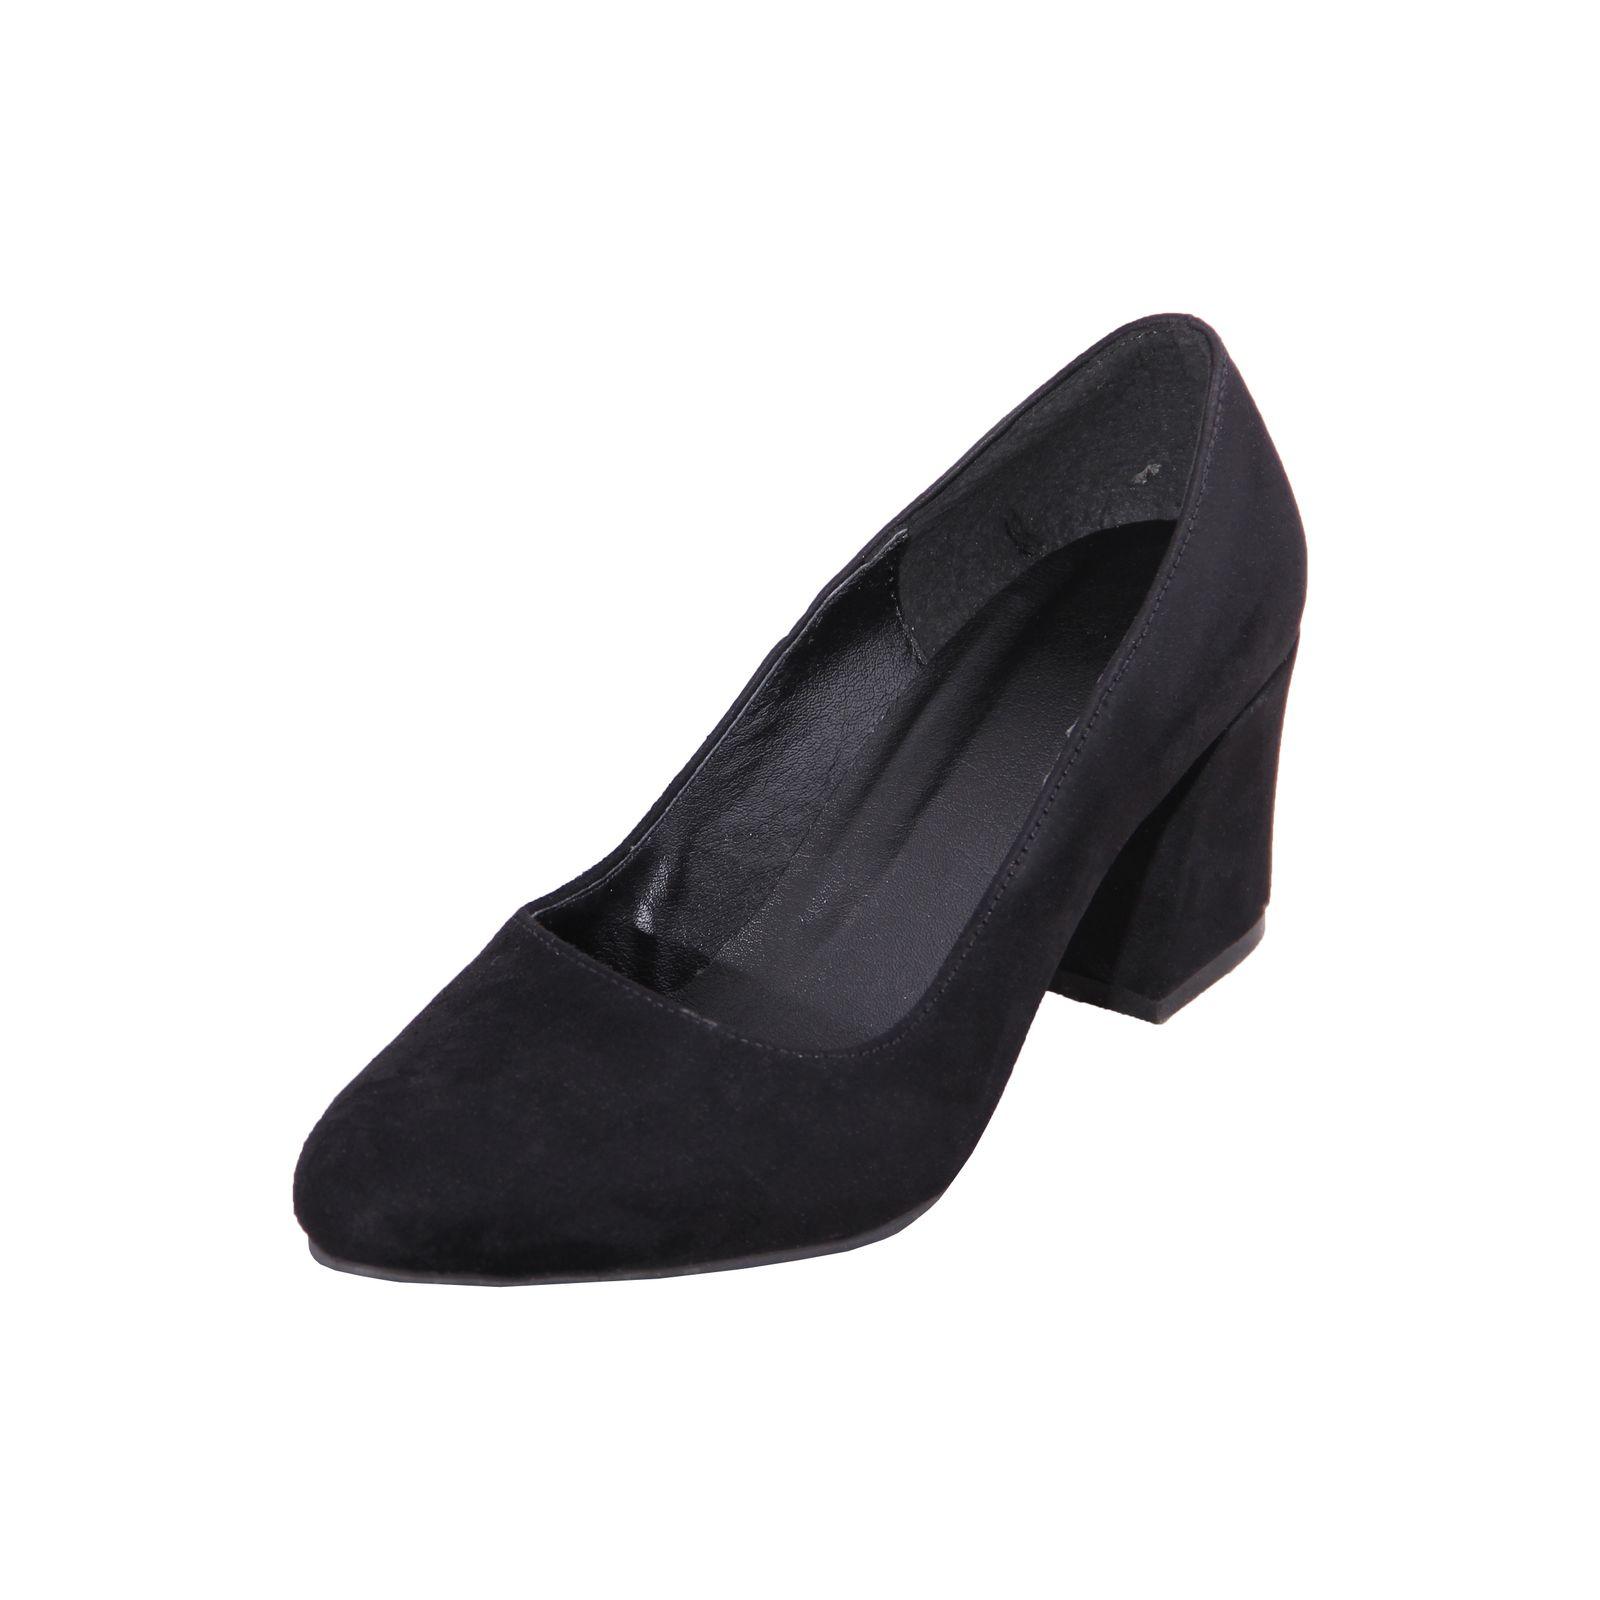 کفش زنانه کد 1-39953  main 1 1